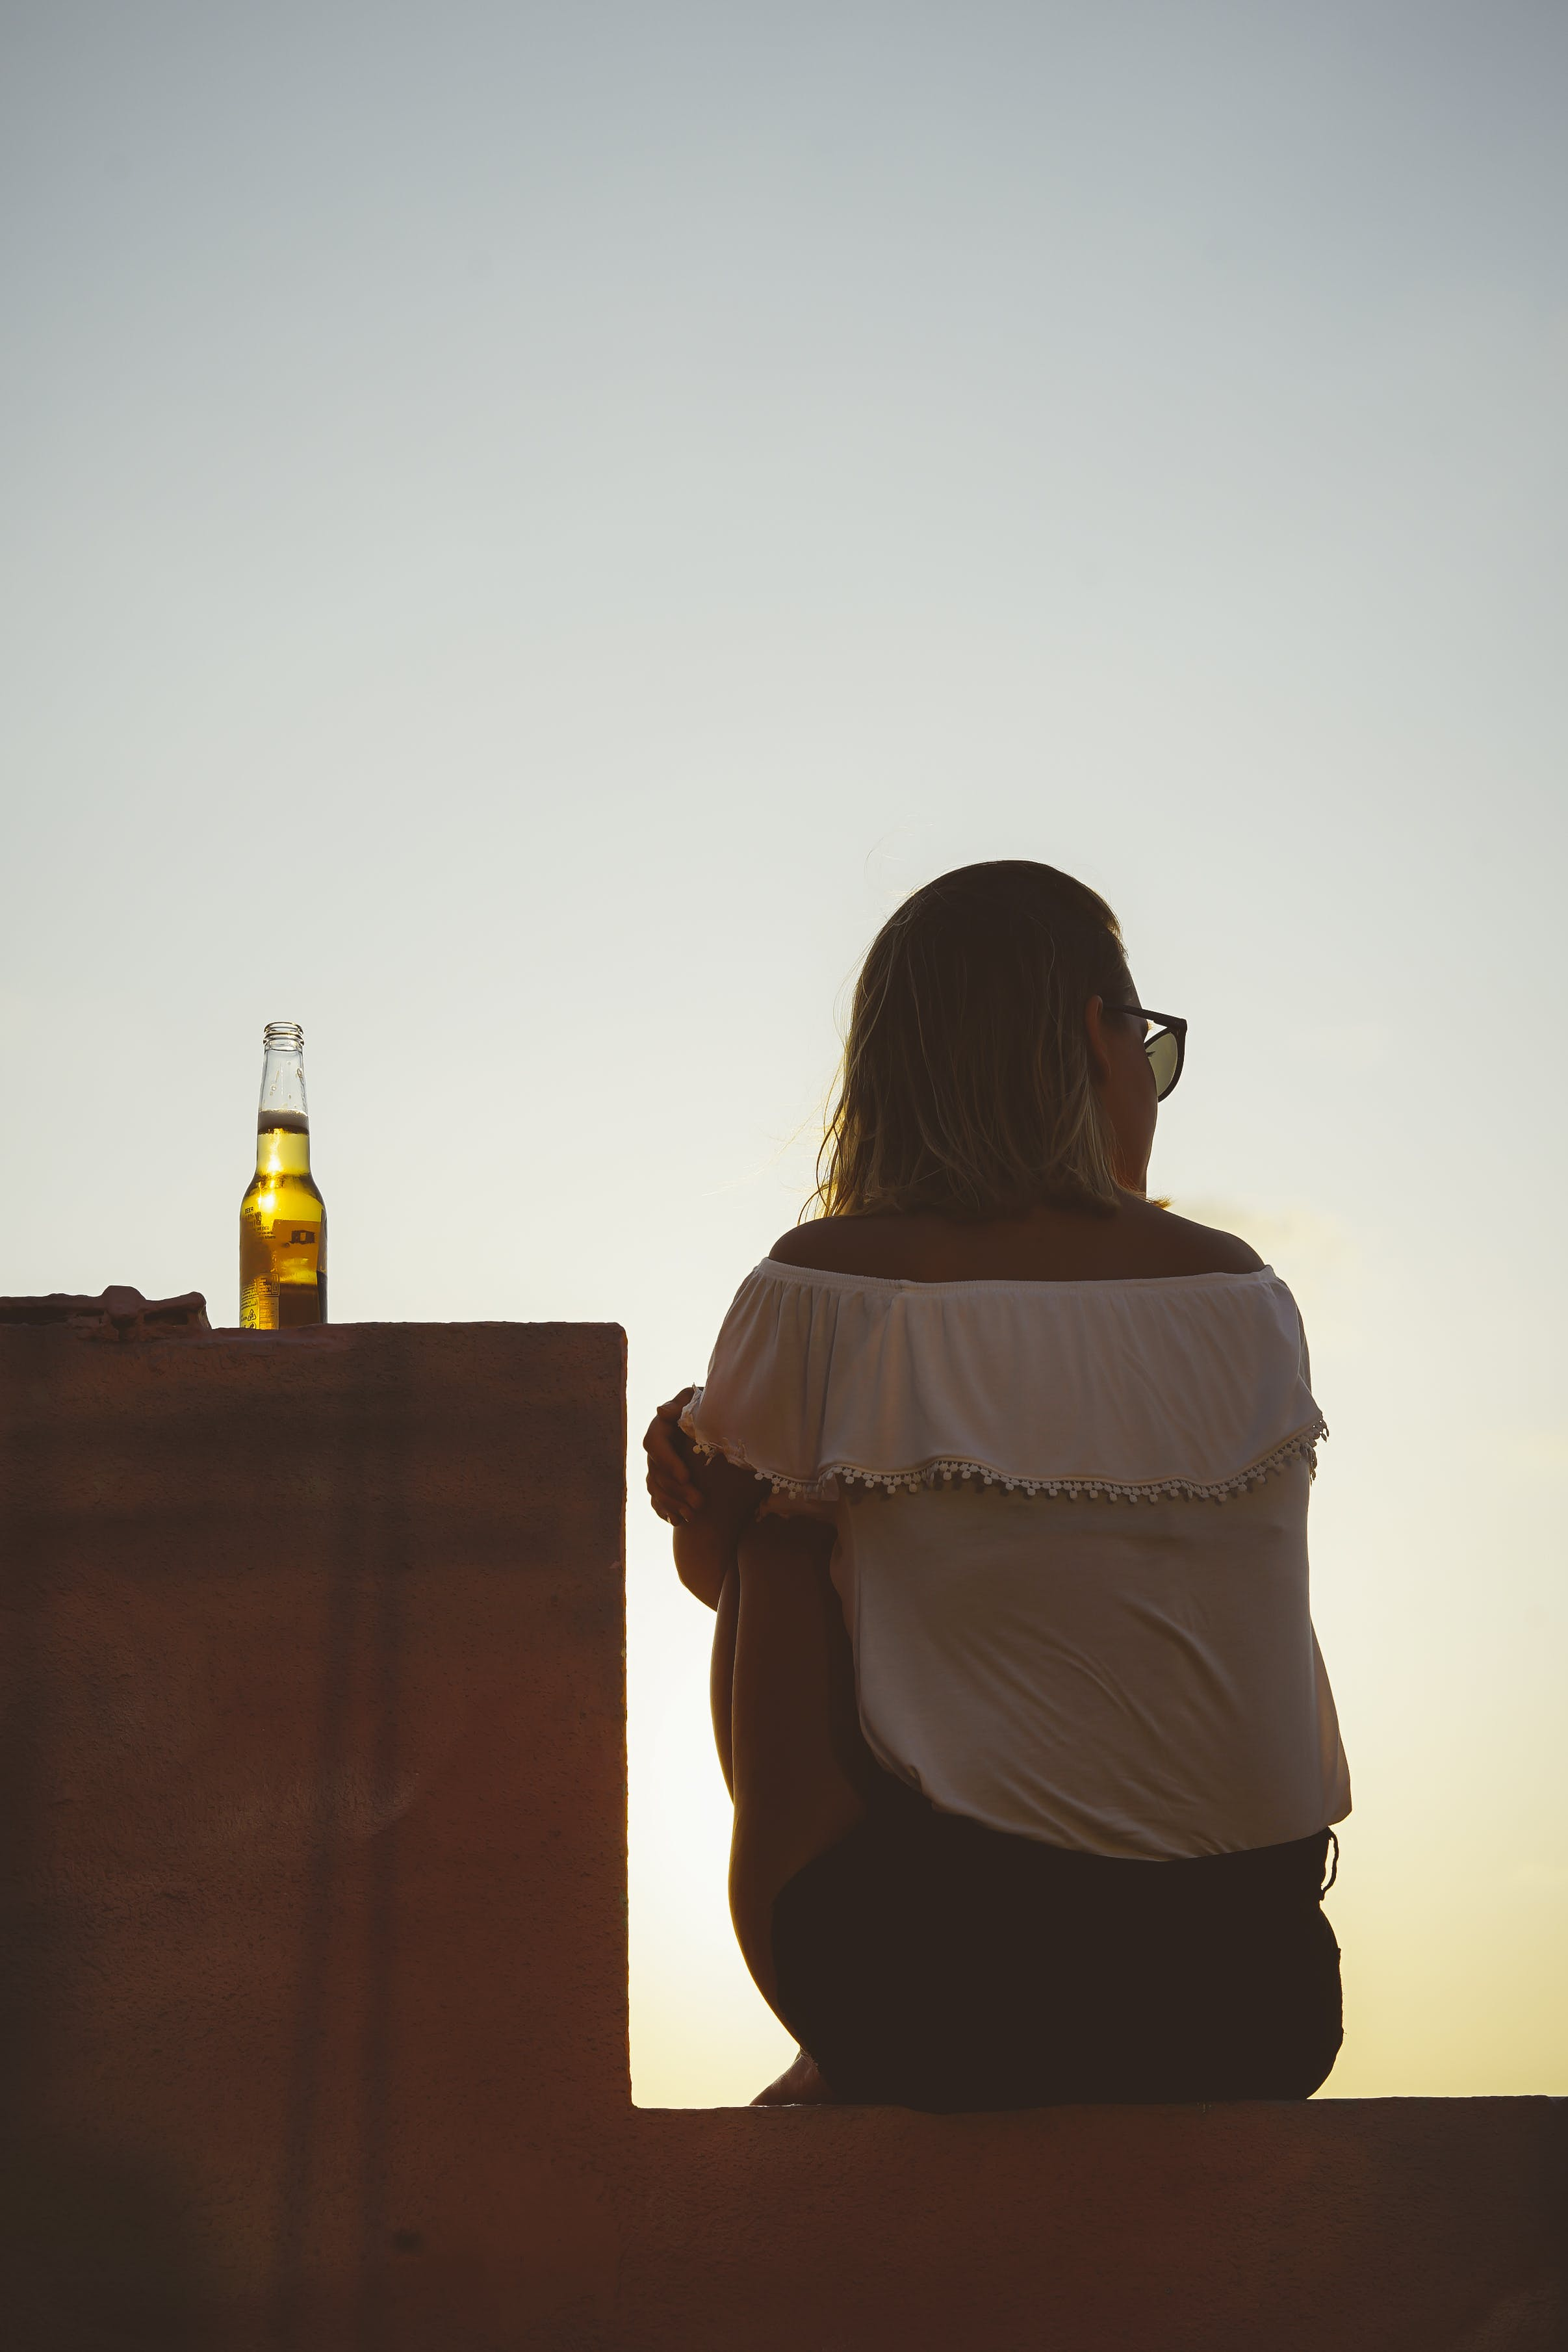 Gratis lagerfoto af afsats, bagbelyst, Drik, drink